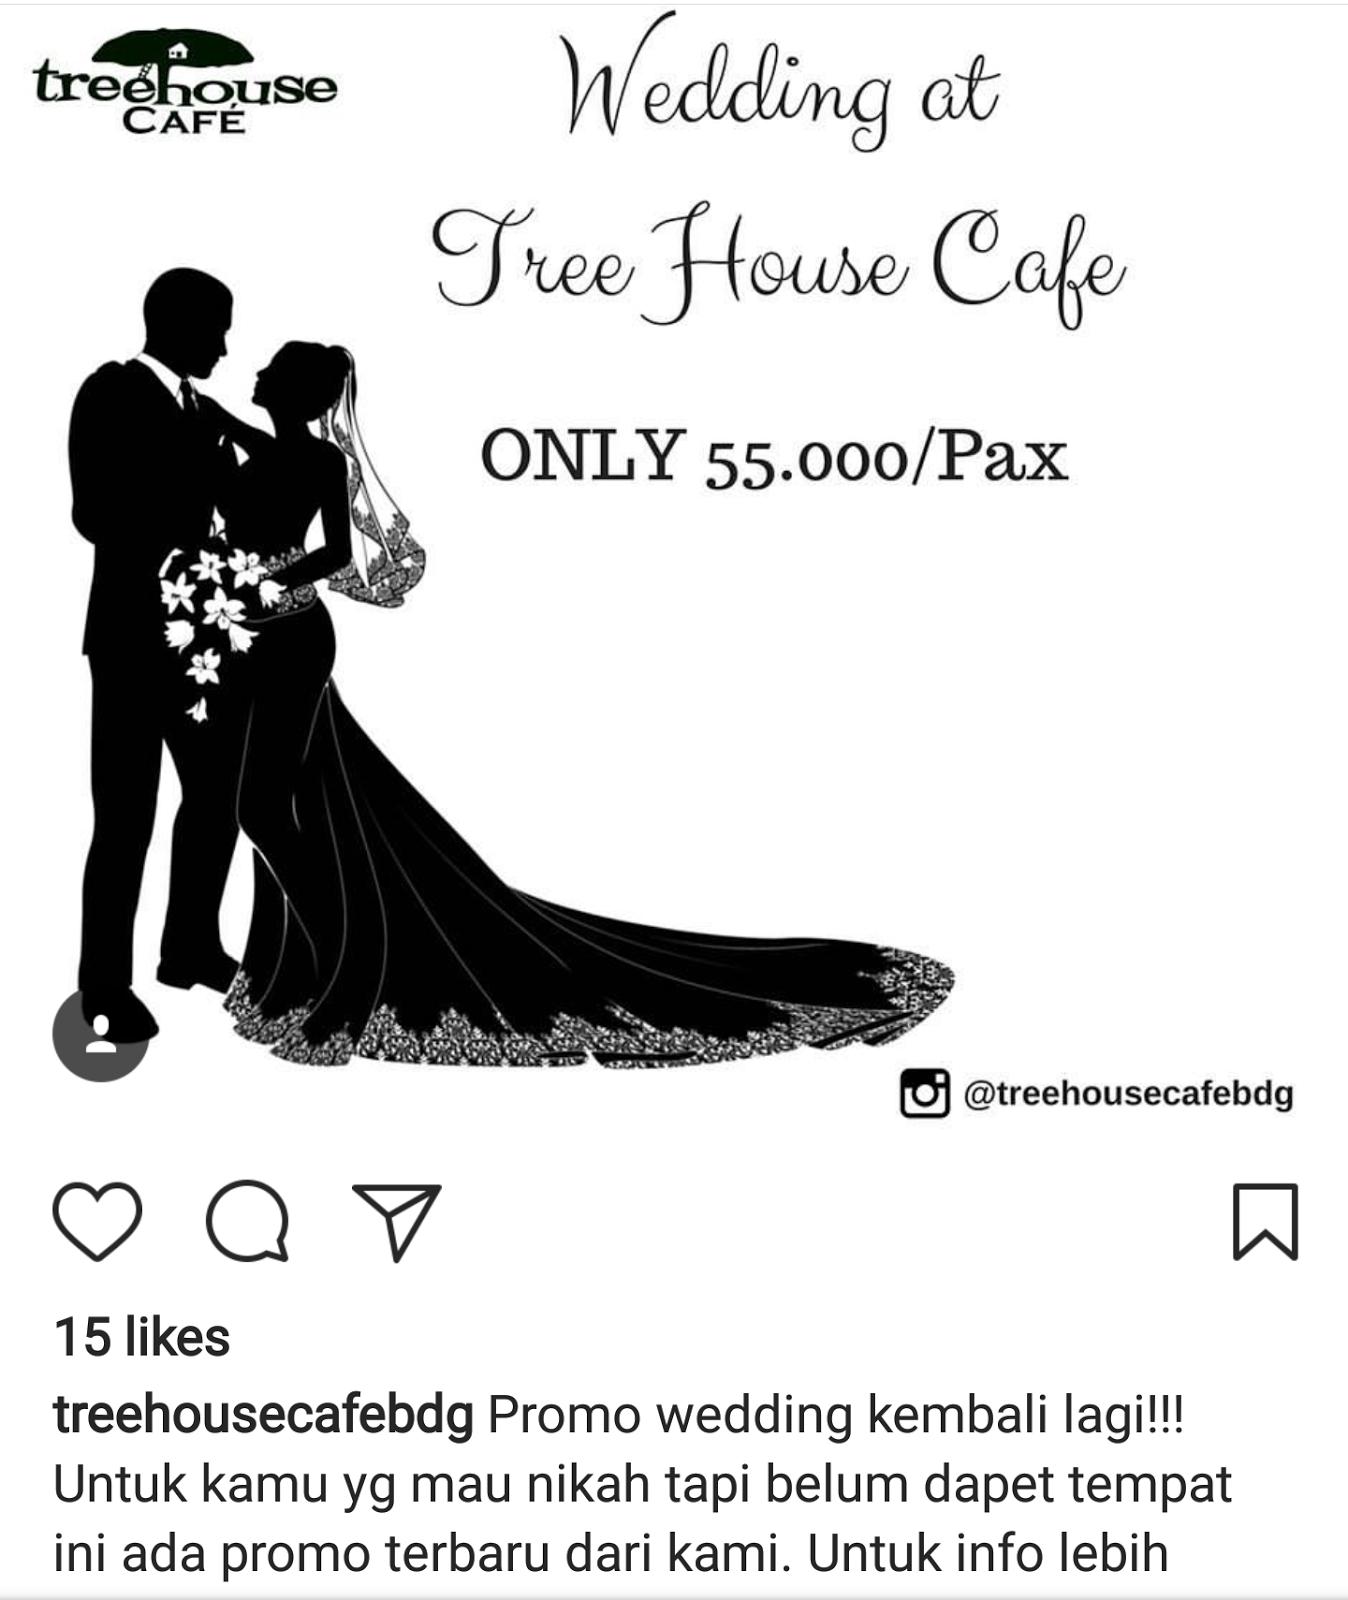 Outdoor Wedding Murah Di Bandung: 3 Tempat Wedding Outdoor Di Bandung (daerah Dago)